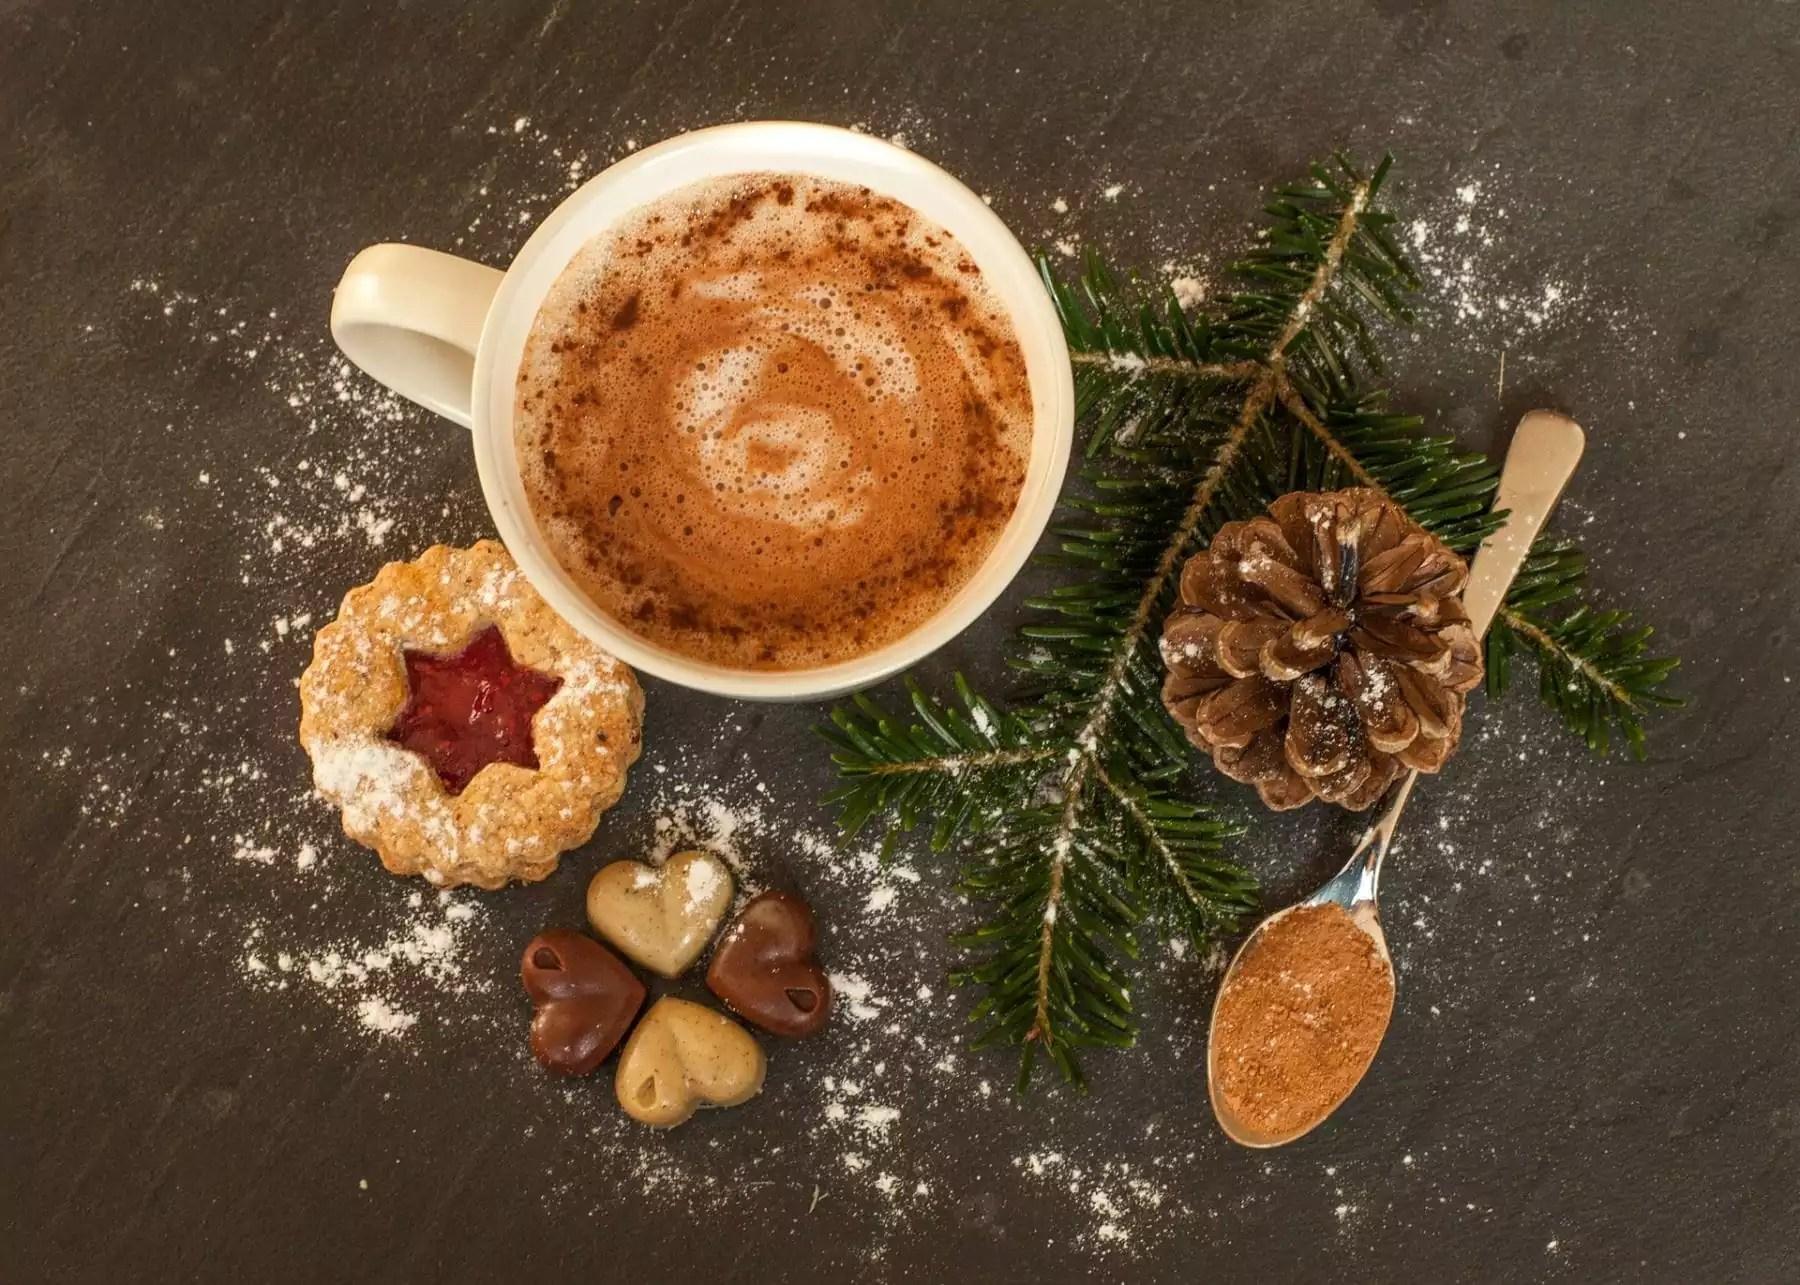 hot chocolate with festive treats